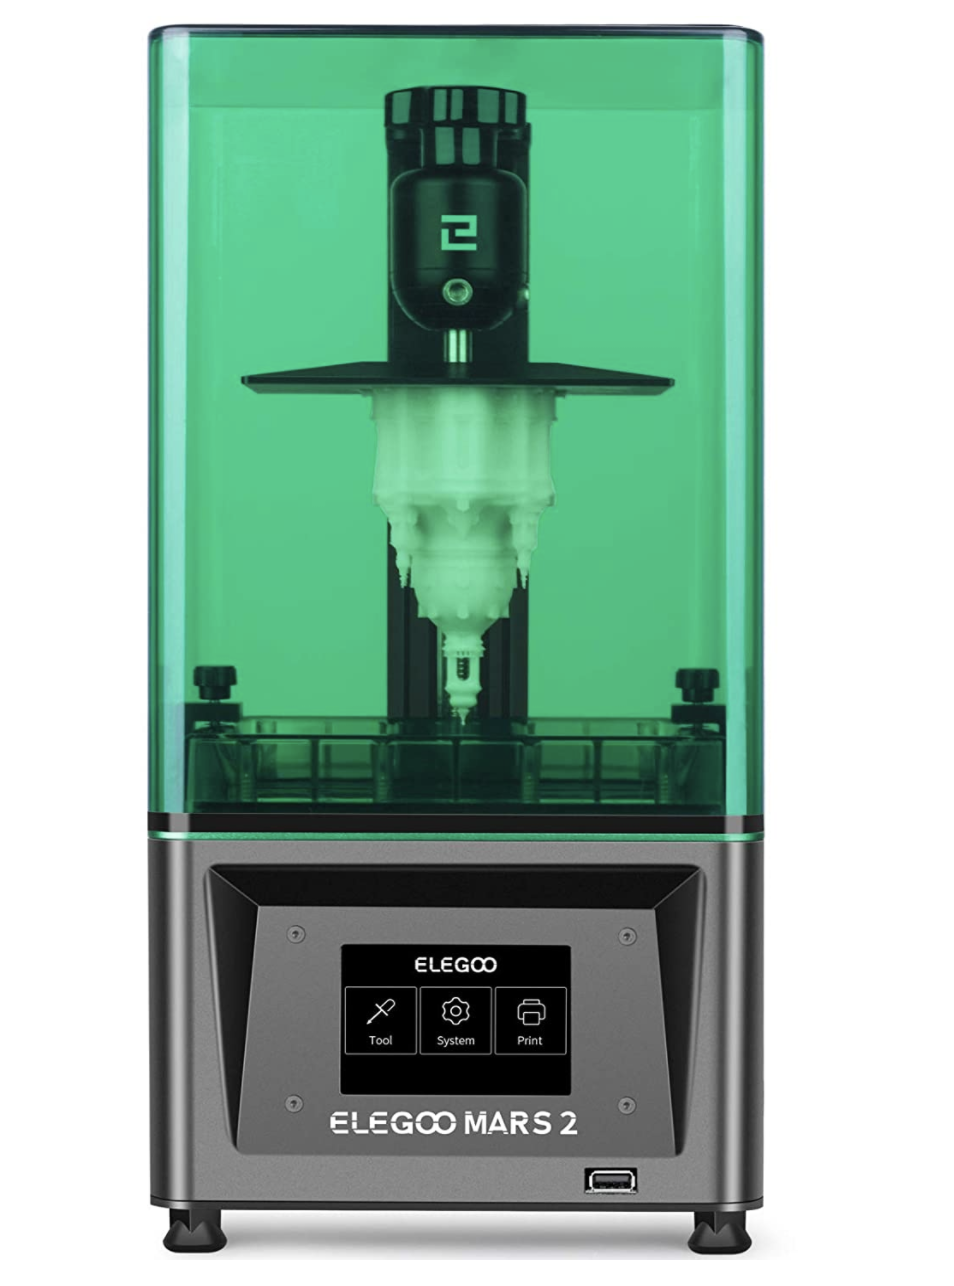 Elegoo Mars 2 MSLA Mono UV Photocuring 3D Printer with 6